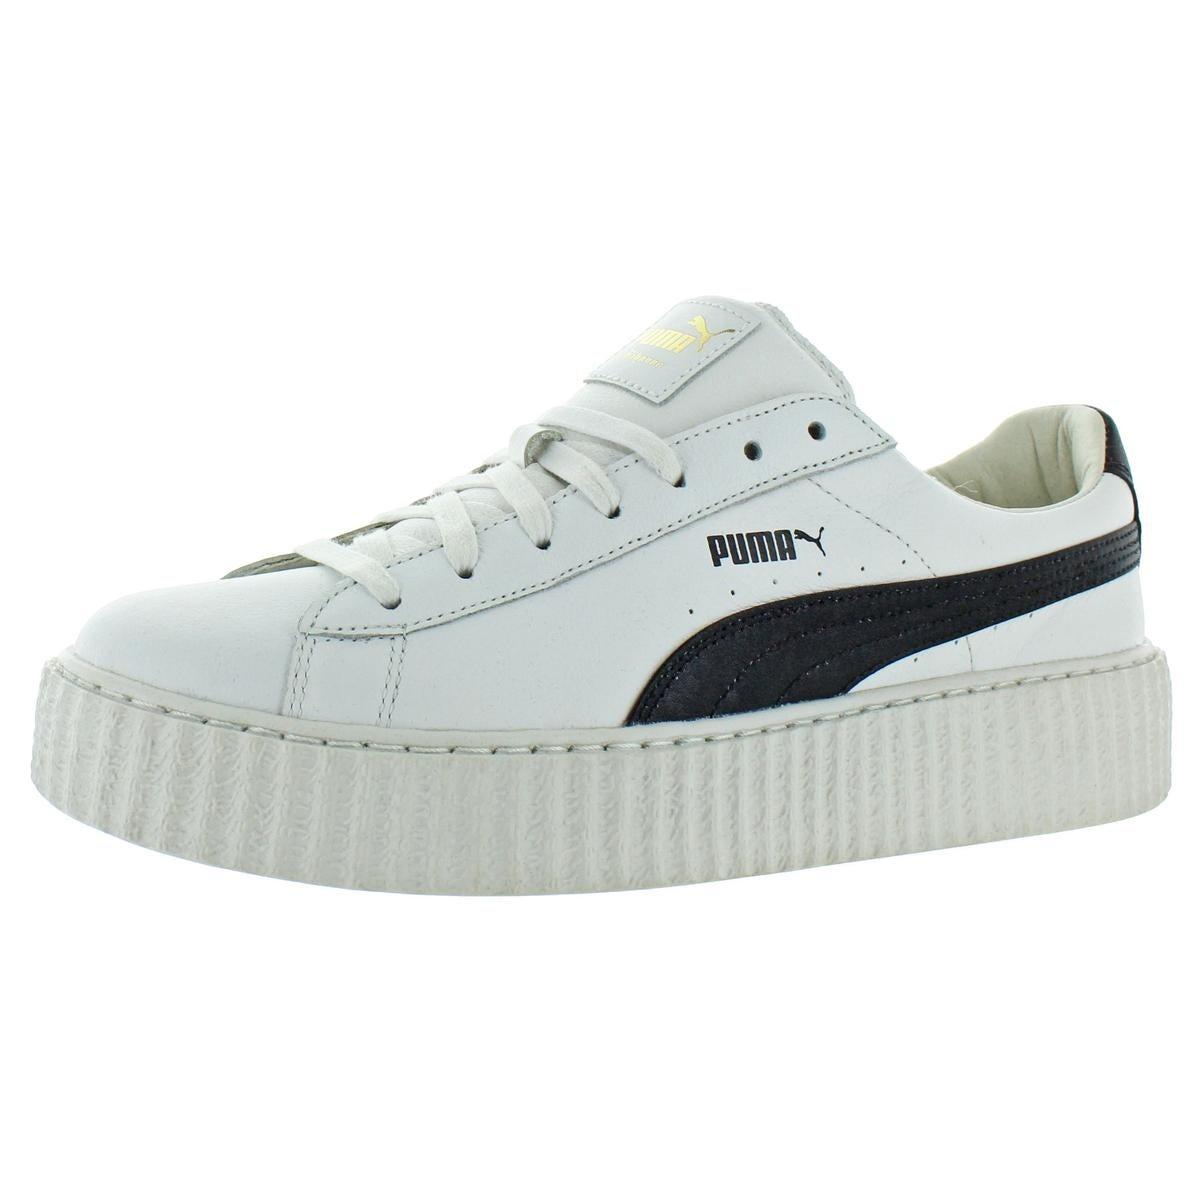 best service 2930c f9614 Fenty Puma by Rihanna Mens Creeper Fashion Sneakers Leather Platform